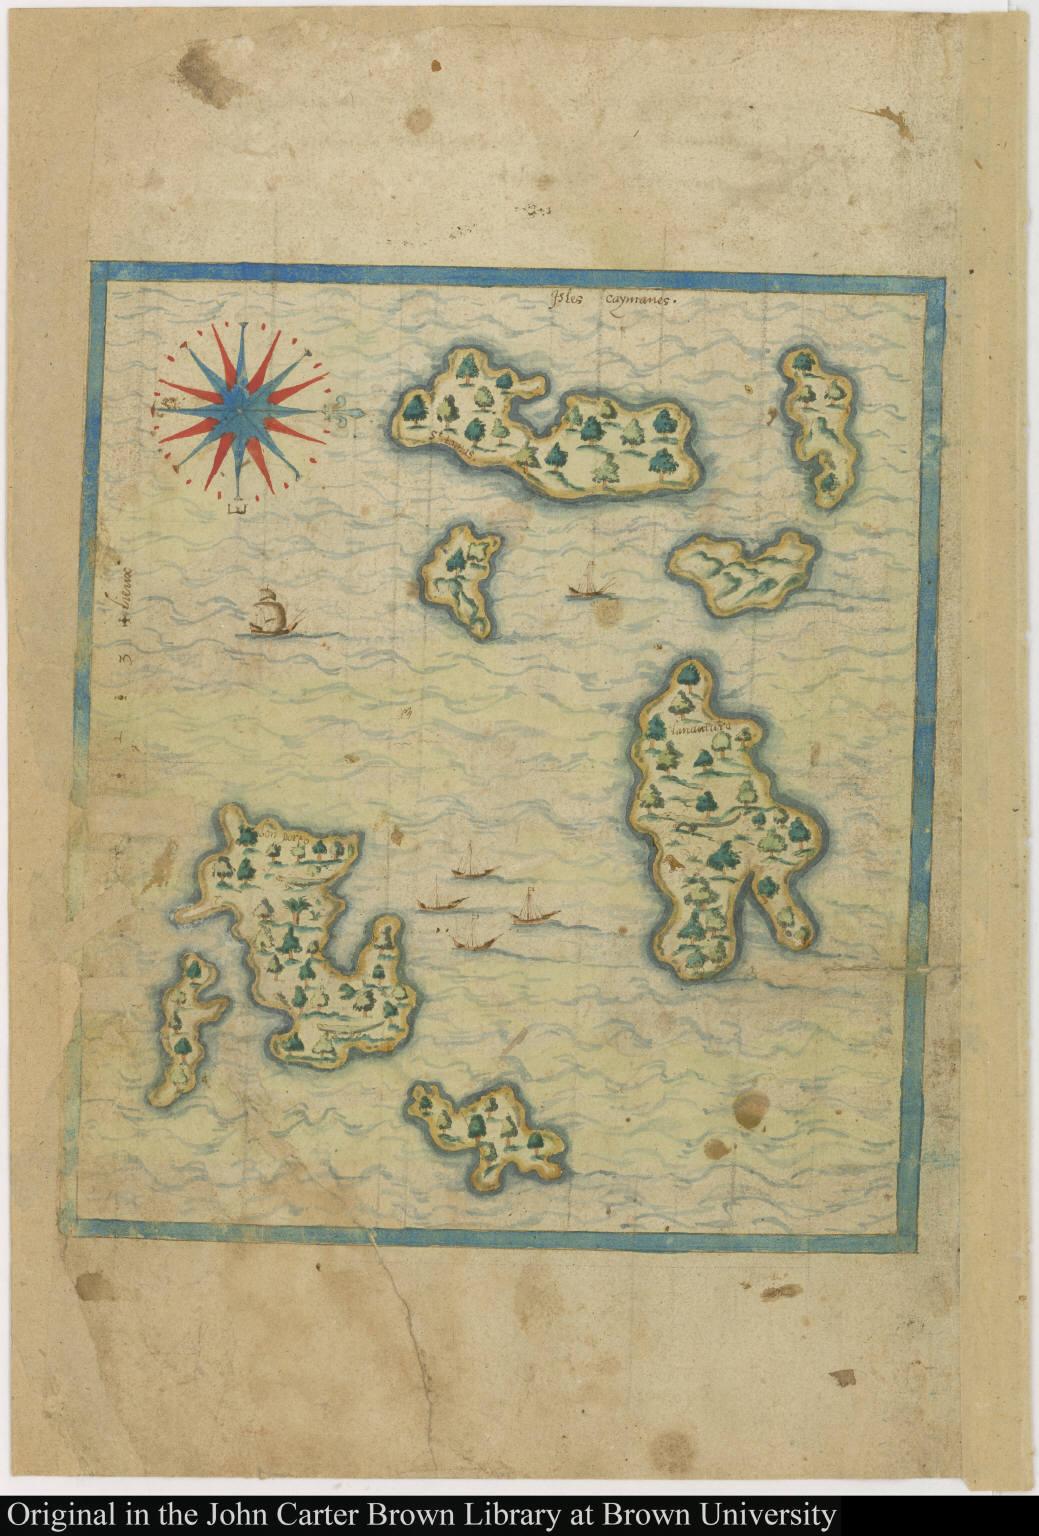 Isles caymanes.